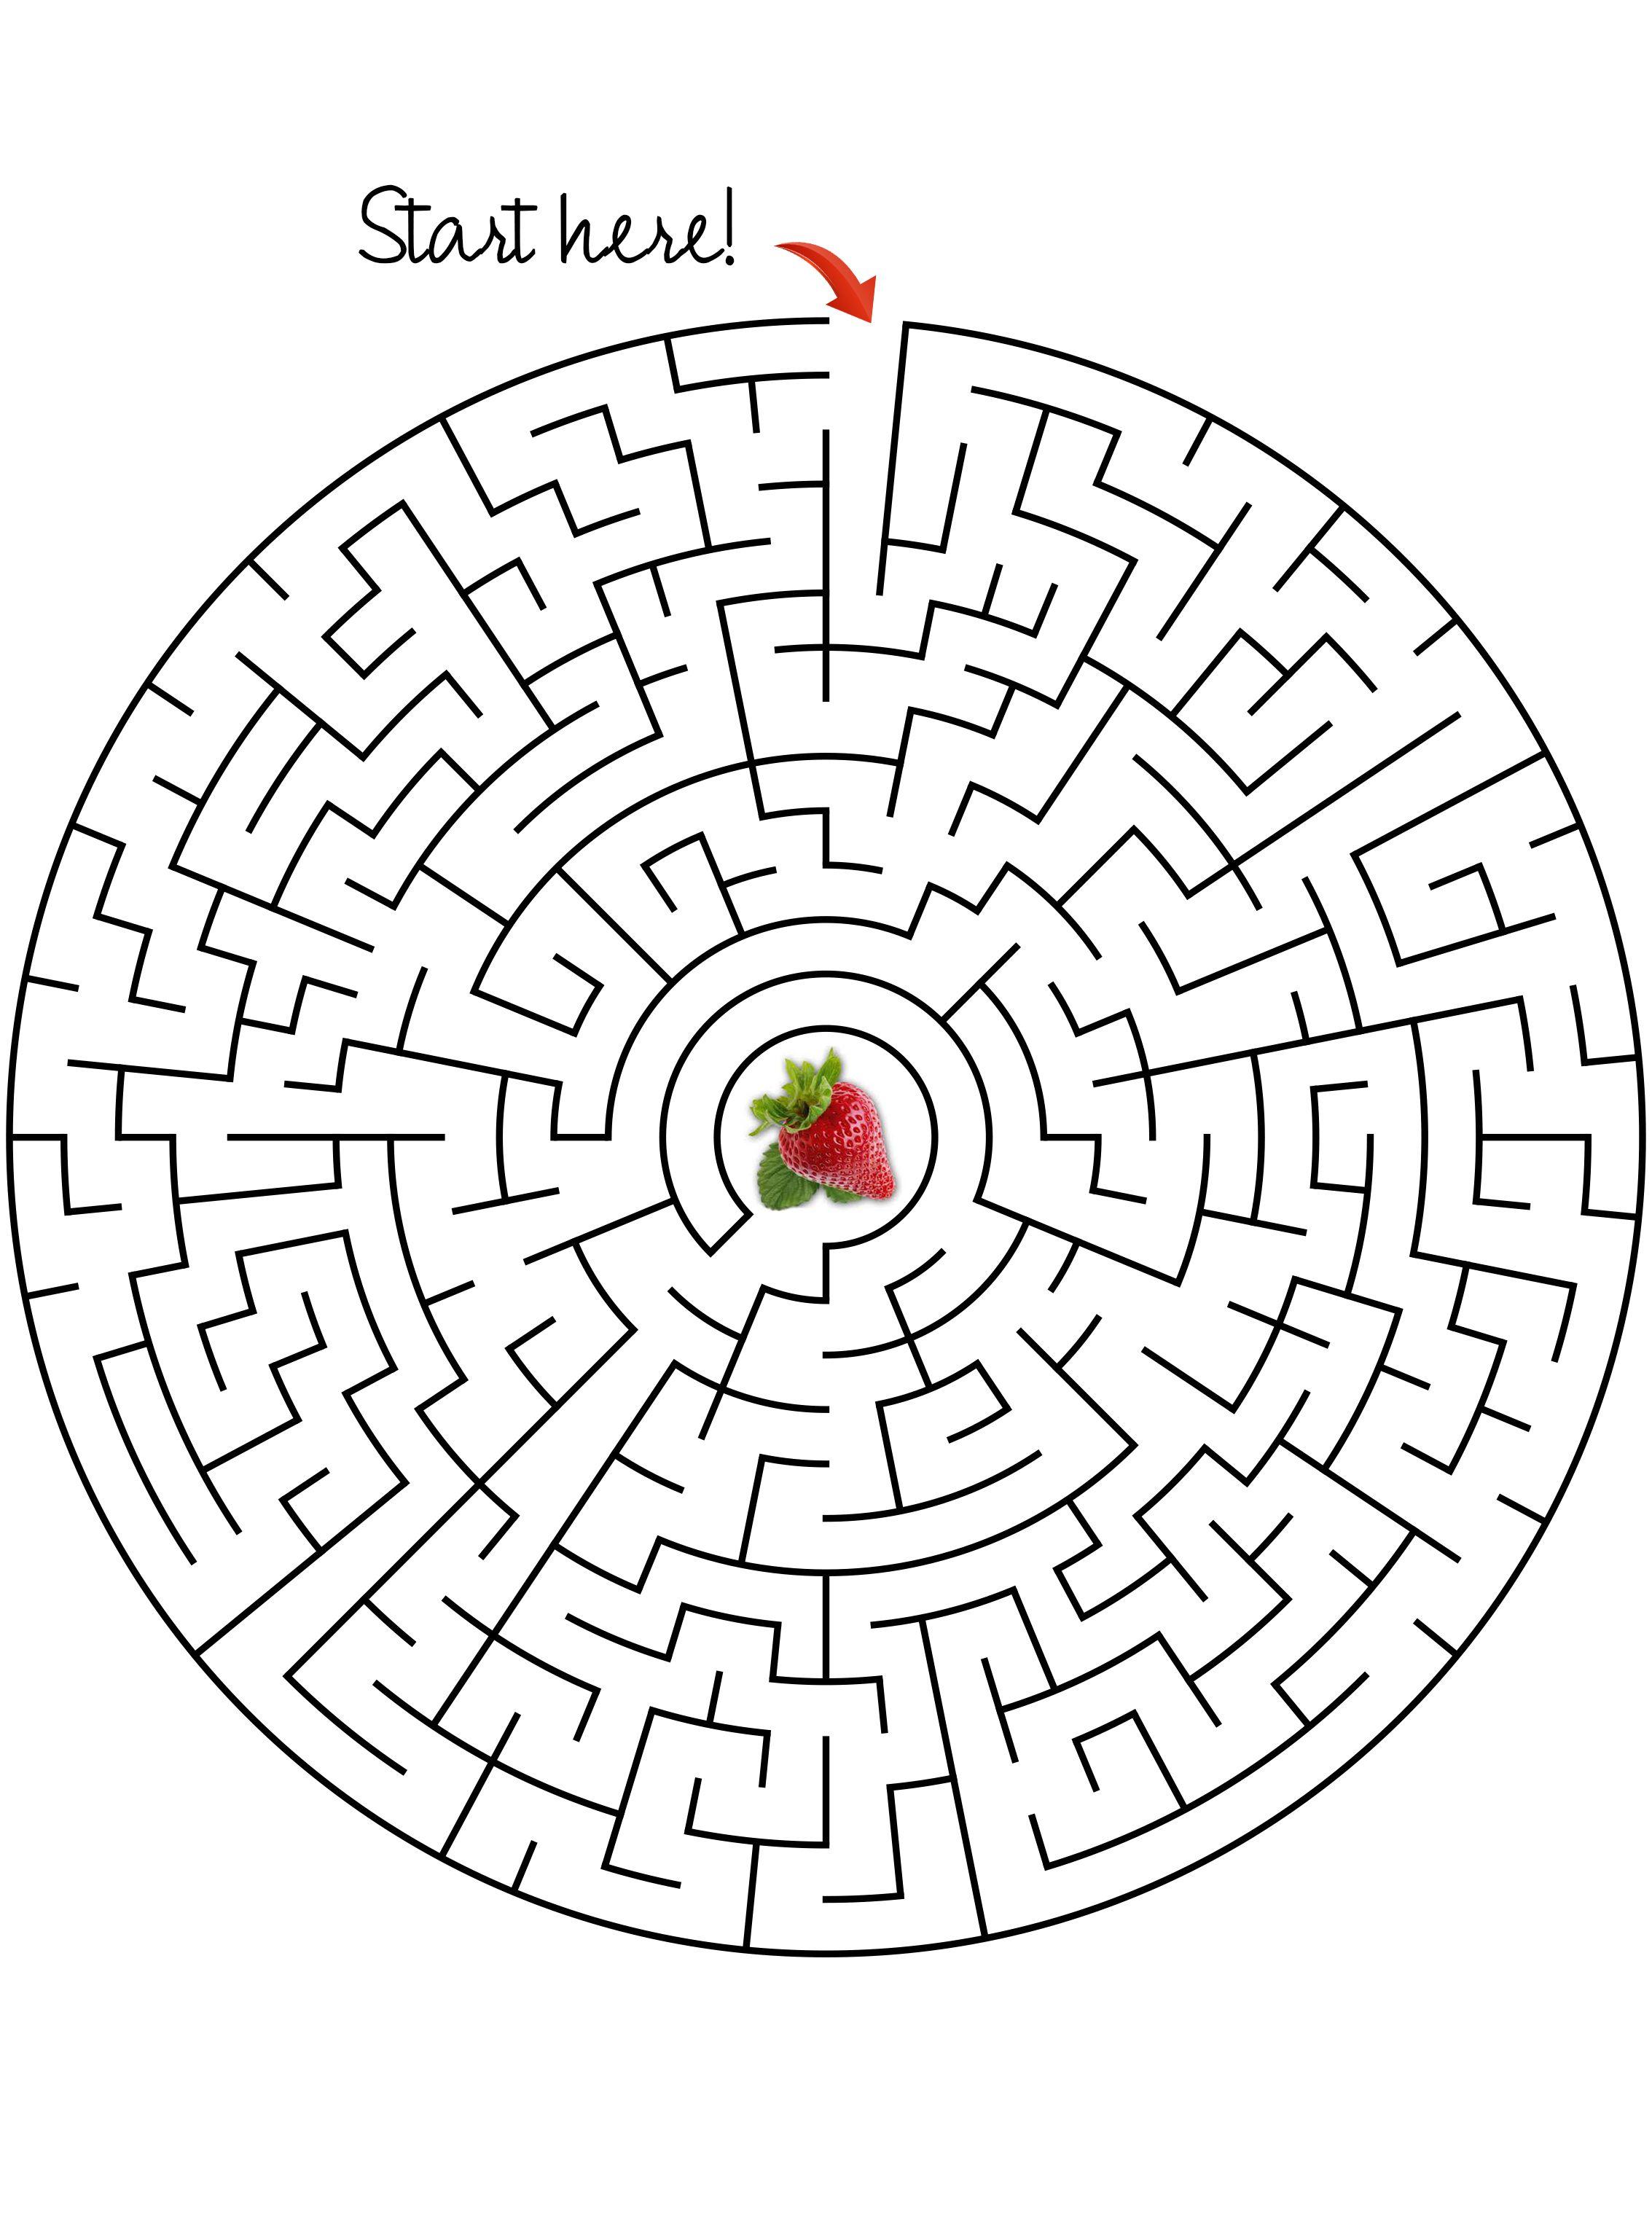 Maze Get The Strawberry Moderate